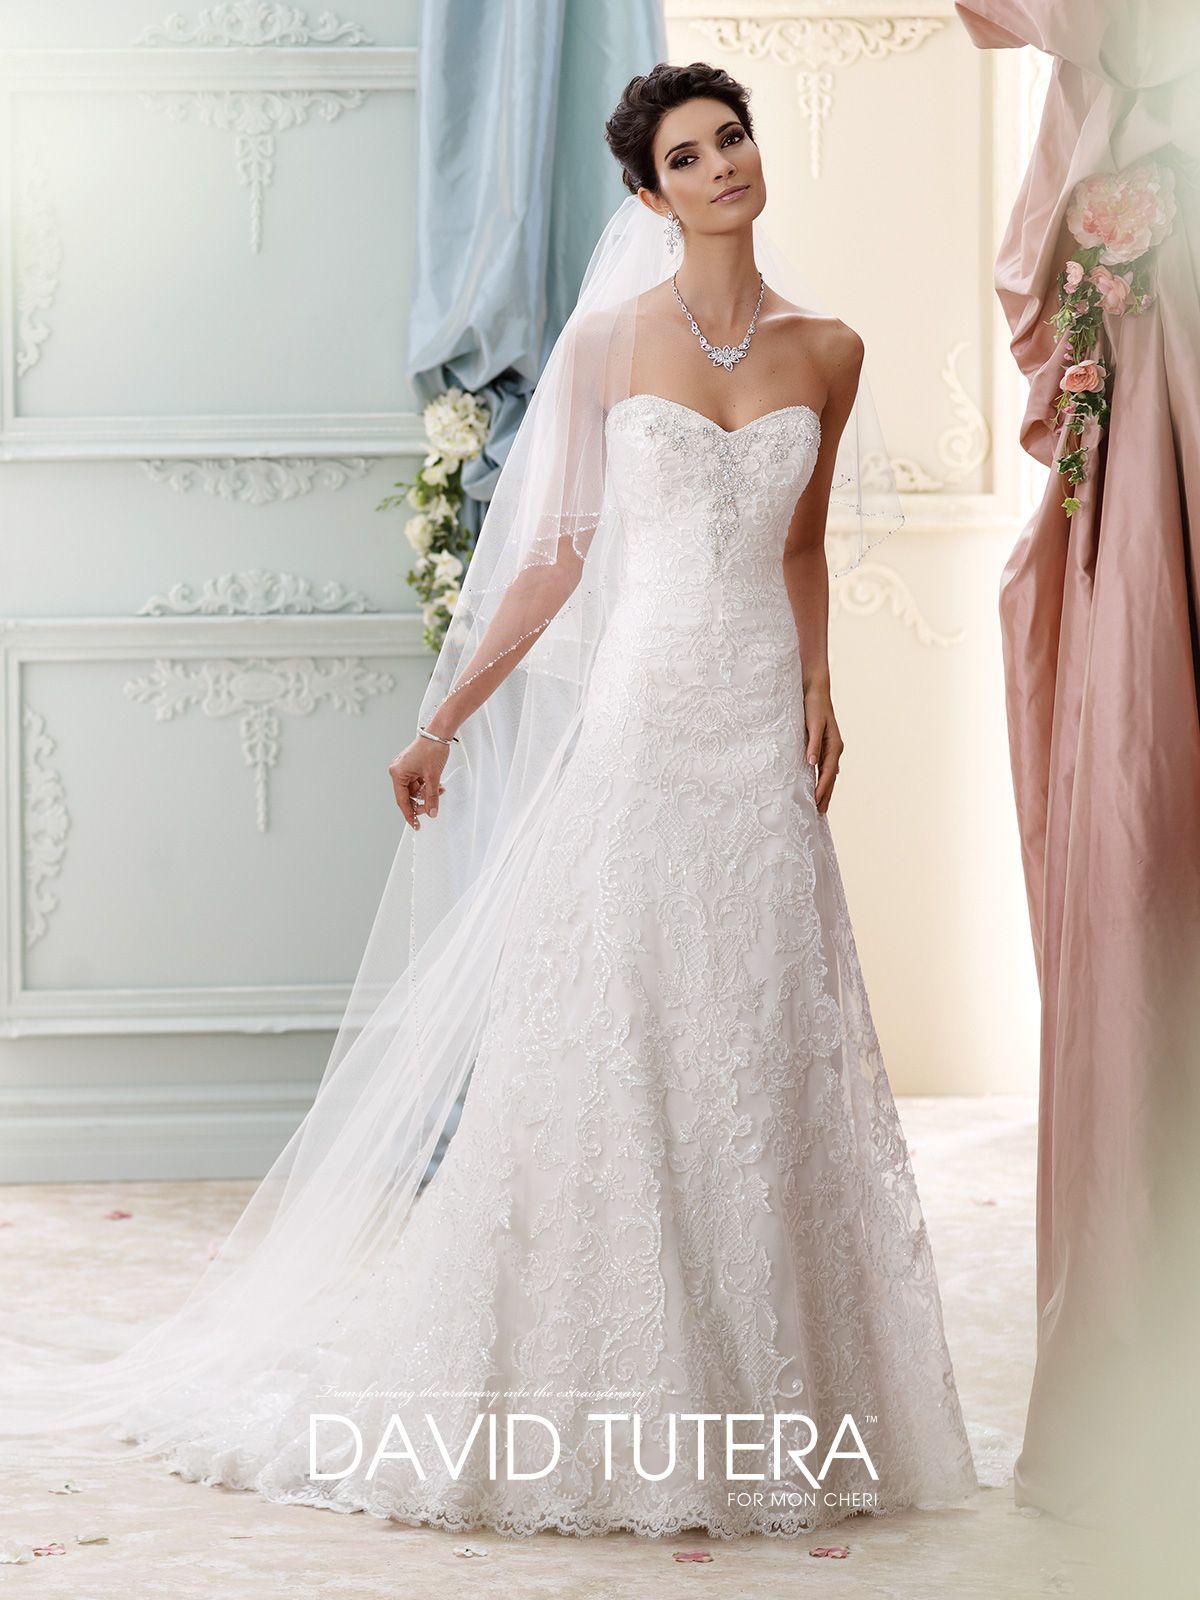 David wedding dress  Unique Wedding Dresses Fall   Martin Thornburg  Pinterest